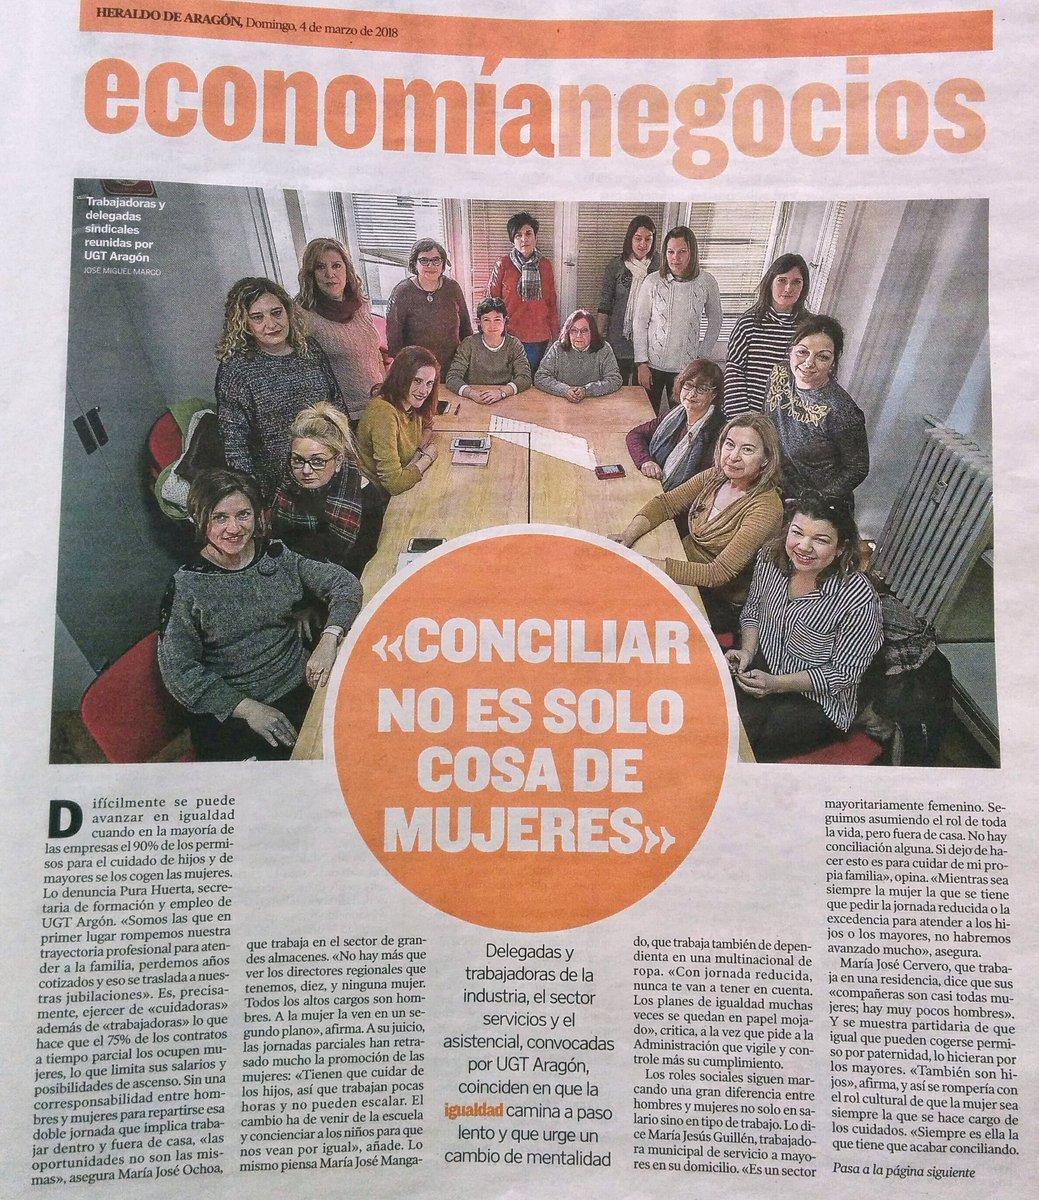 Jorge Albericio On Twitter Portada Suplemento Heraldo Domingo